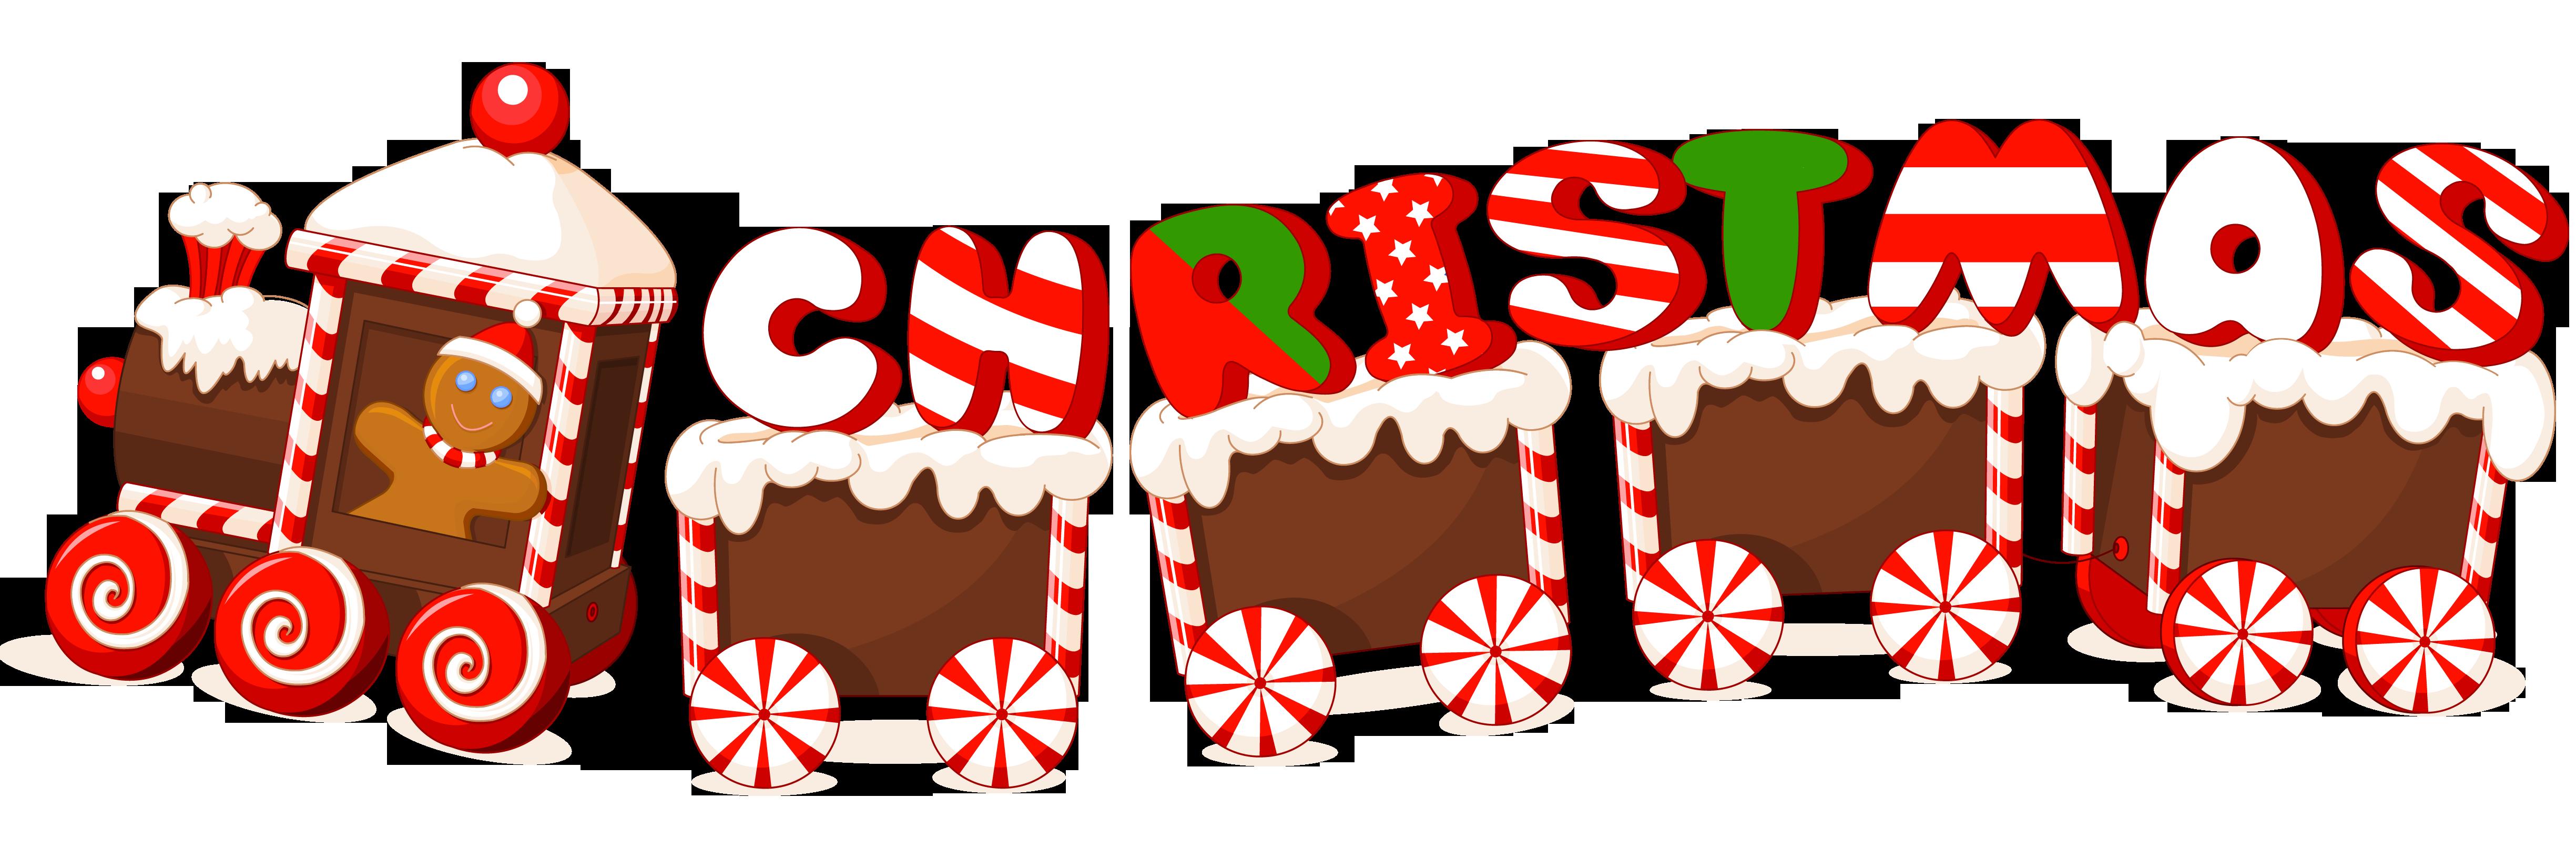 Text clipart christmas party Christmas Christmas Merry Clipart Savoronmorehead